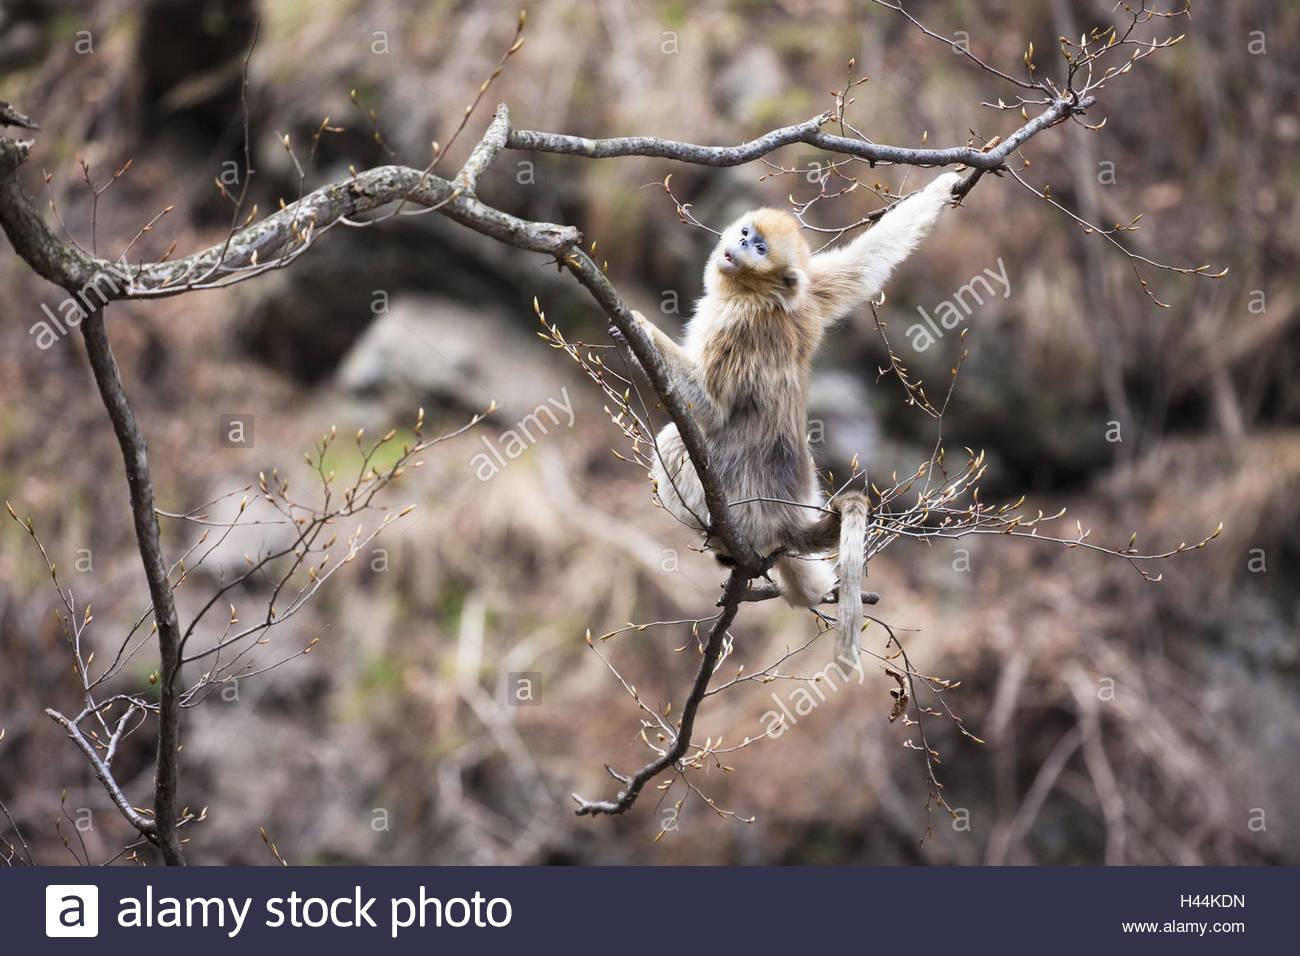 Monkey, golden snub-nosed monkeys, Rhinopithecus roxellana, tree, branches, climb, - Stock Image